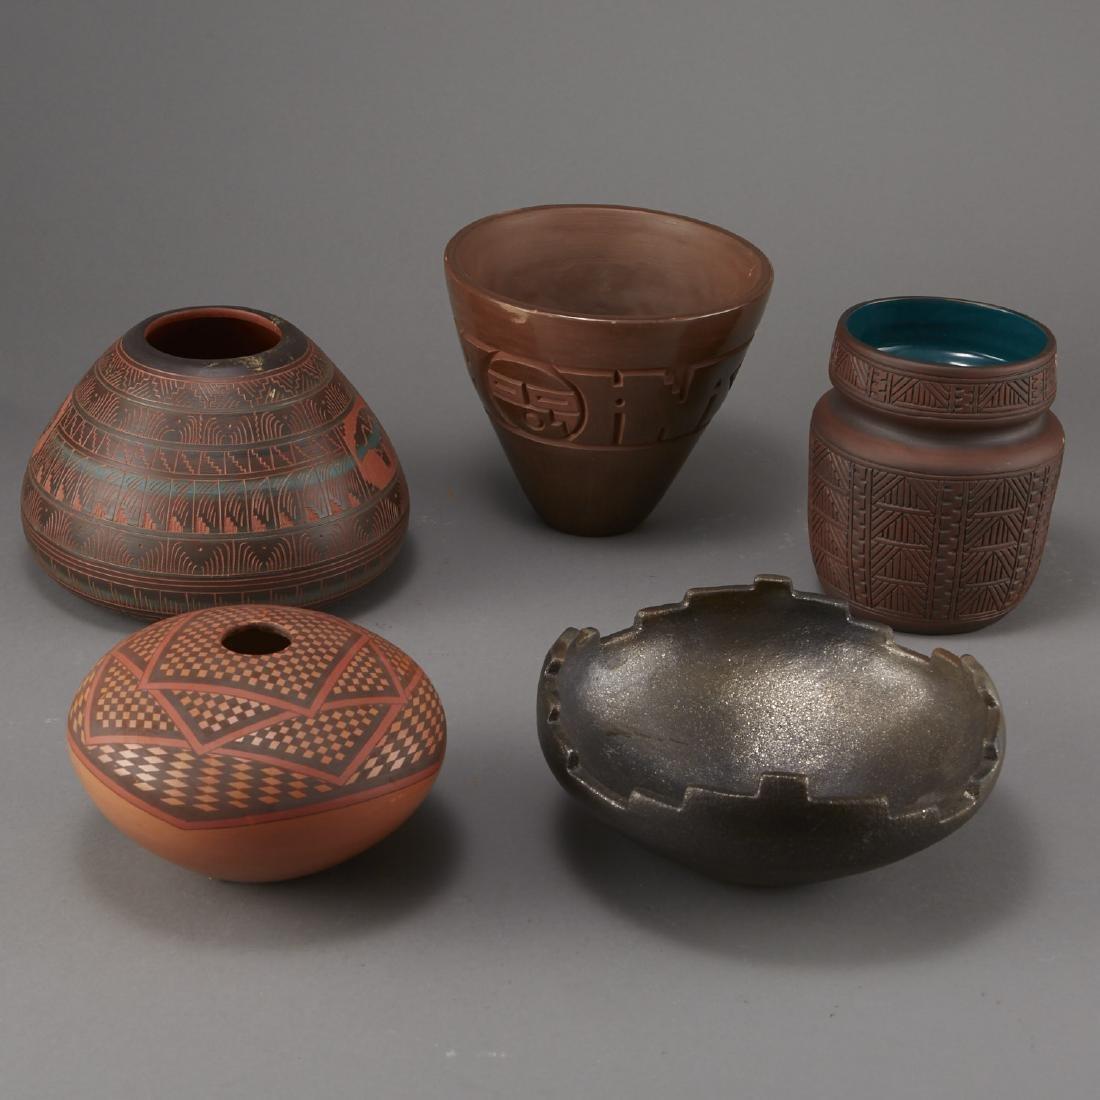 5 Pieces of Native American Pottery Sheldon Nunez